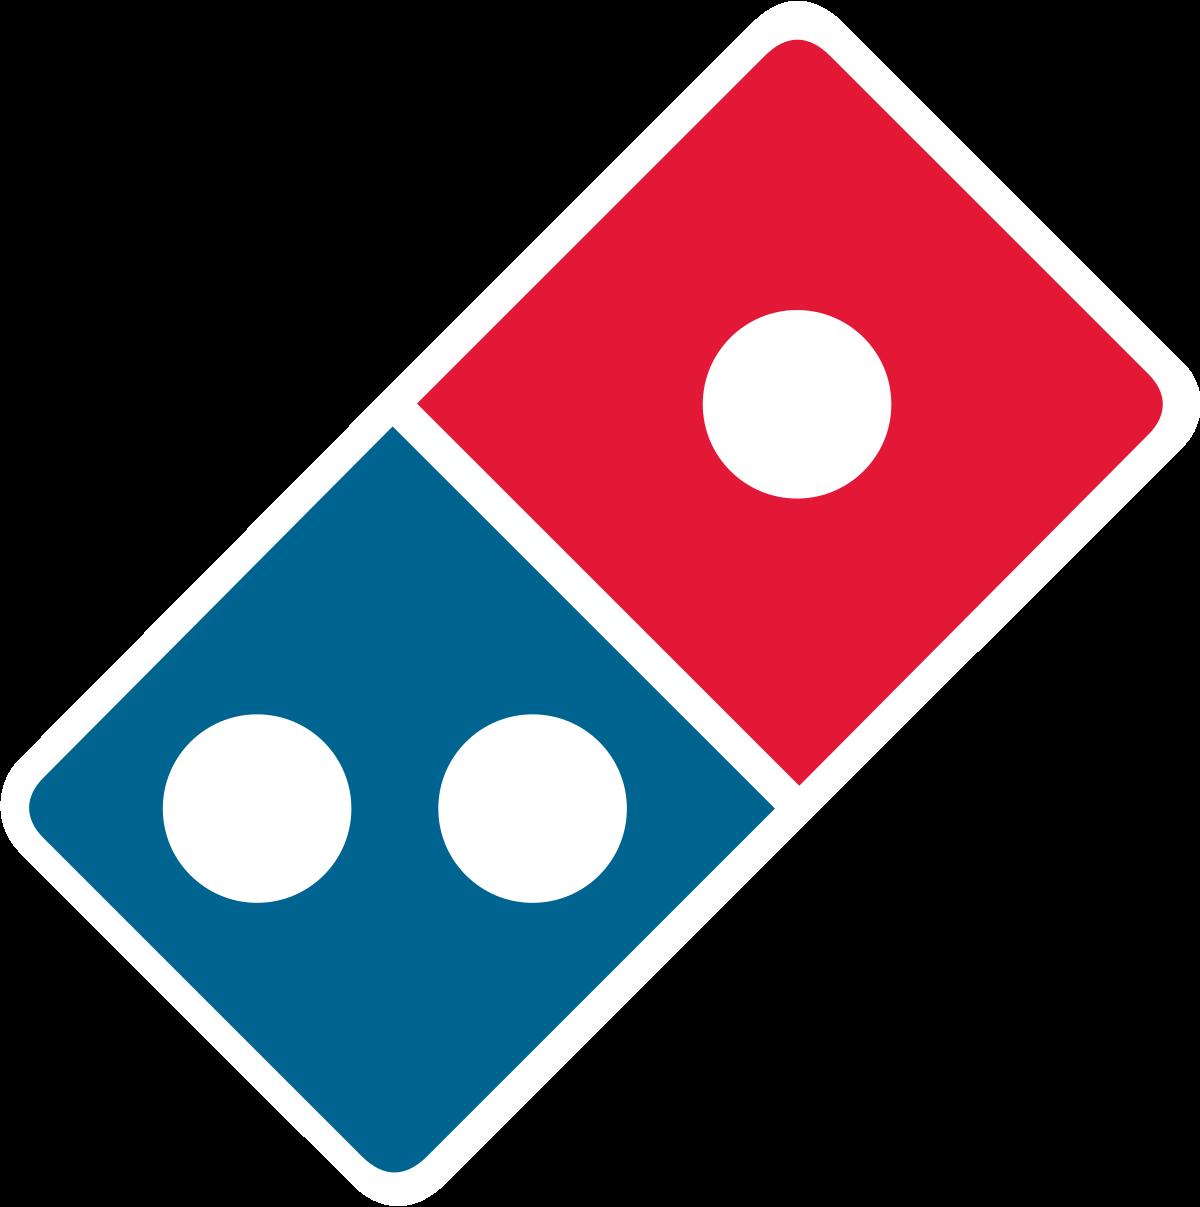 Domino clipart counting. S pizza wikipedia